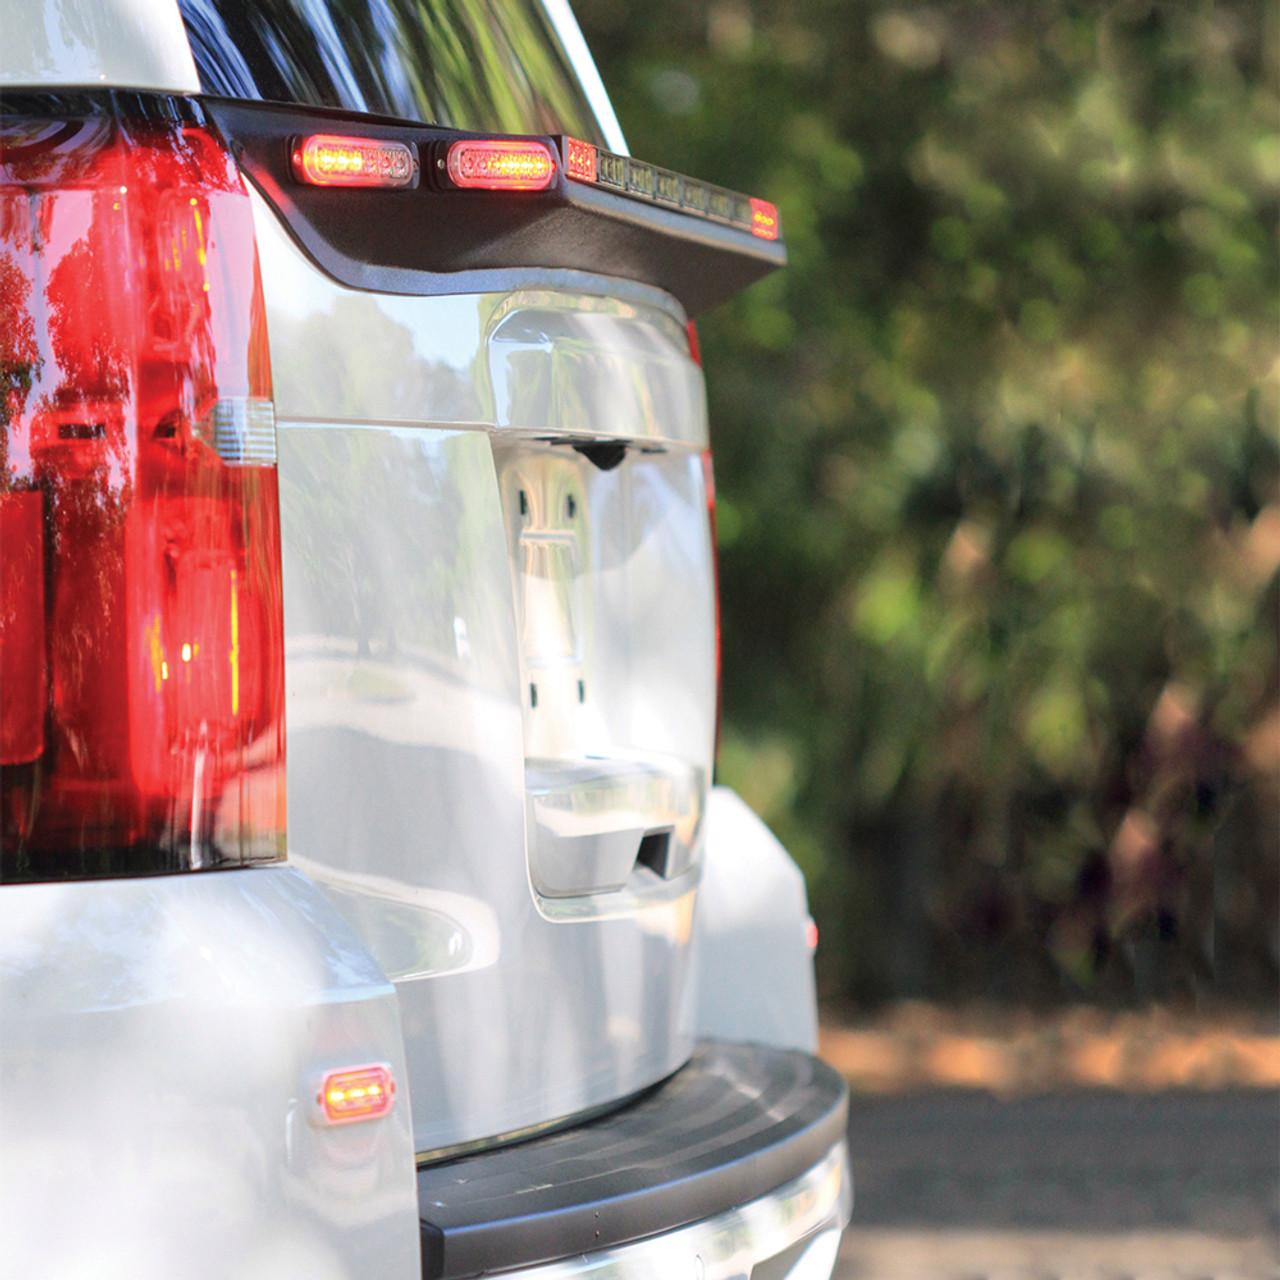 Brooking Industries HZNS Horizon Traffic Advisor / Warning Stick, Choose 2, 4, 6, 8 or 10 Lightheads Per Stick, Single Color